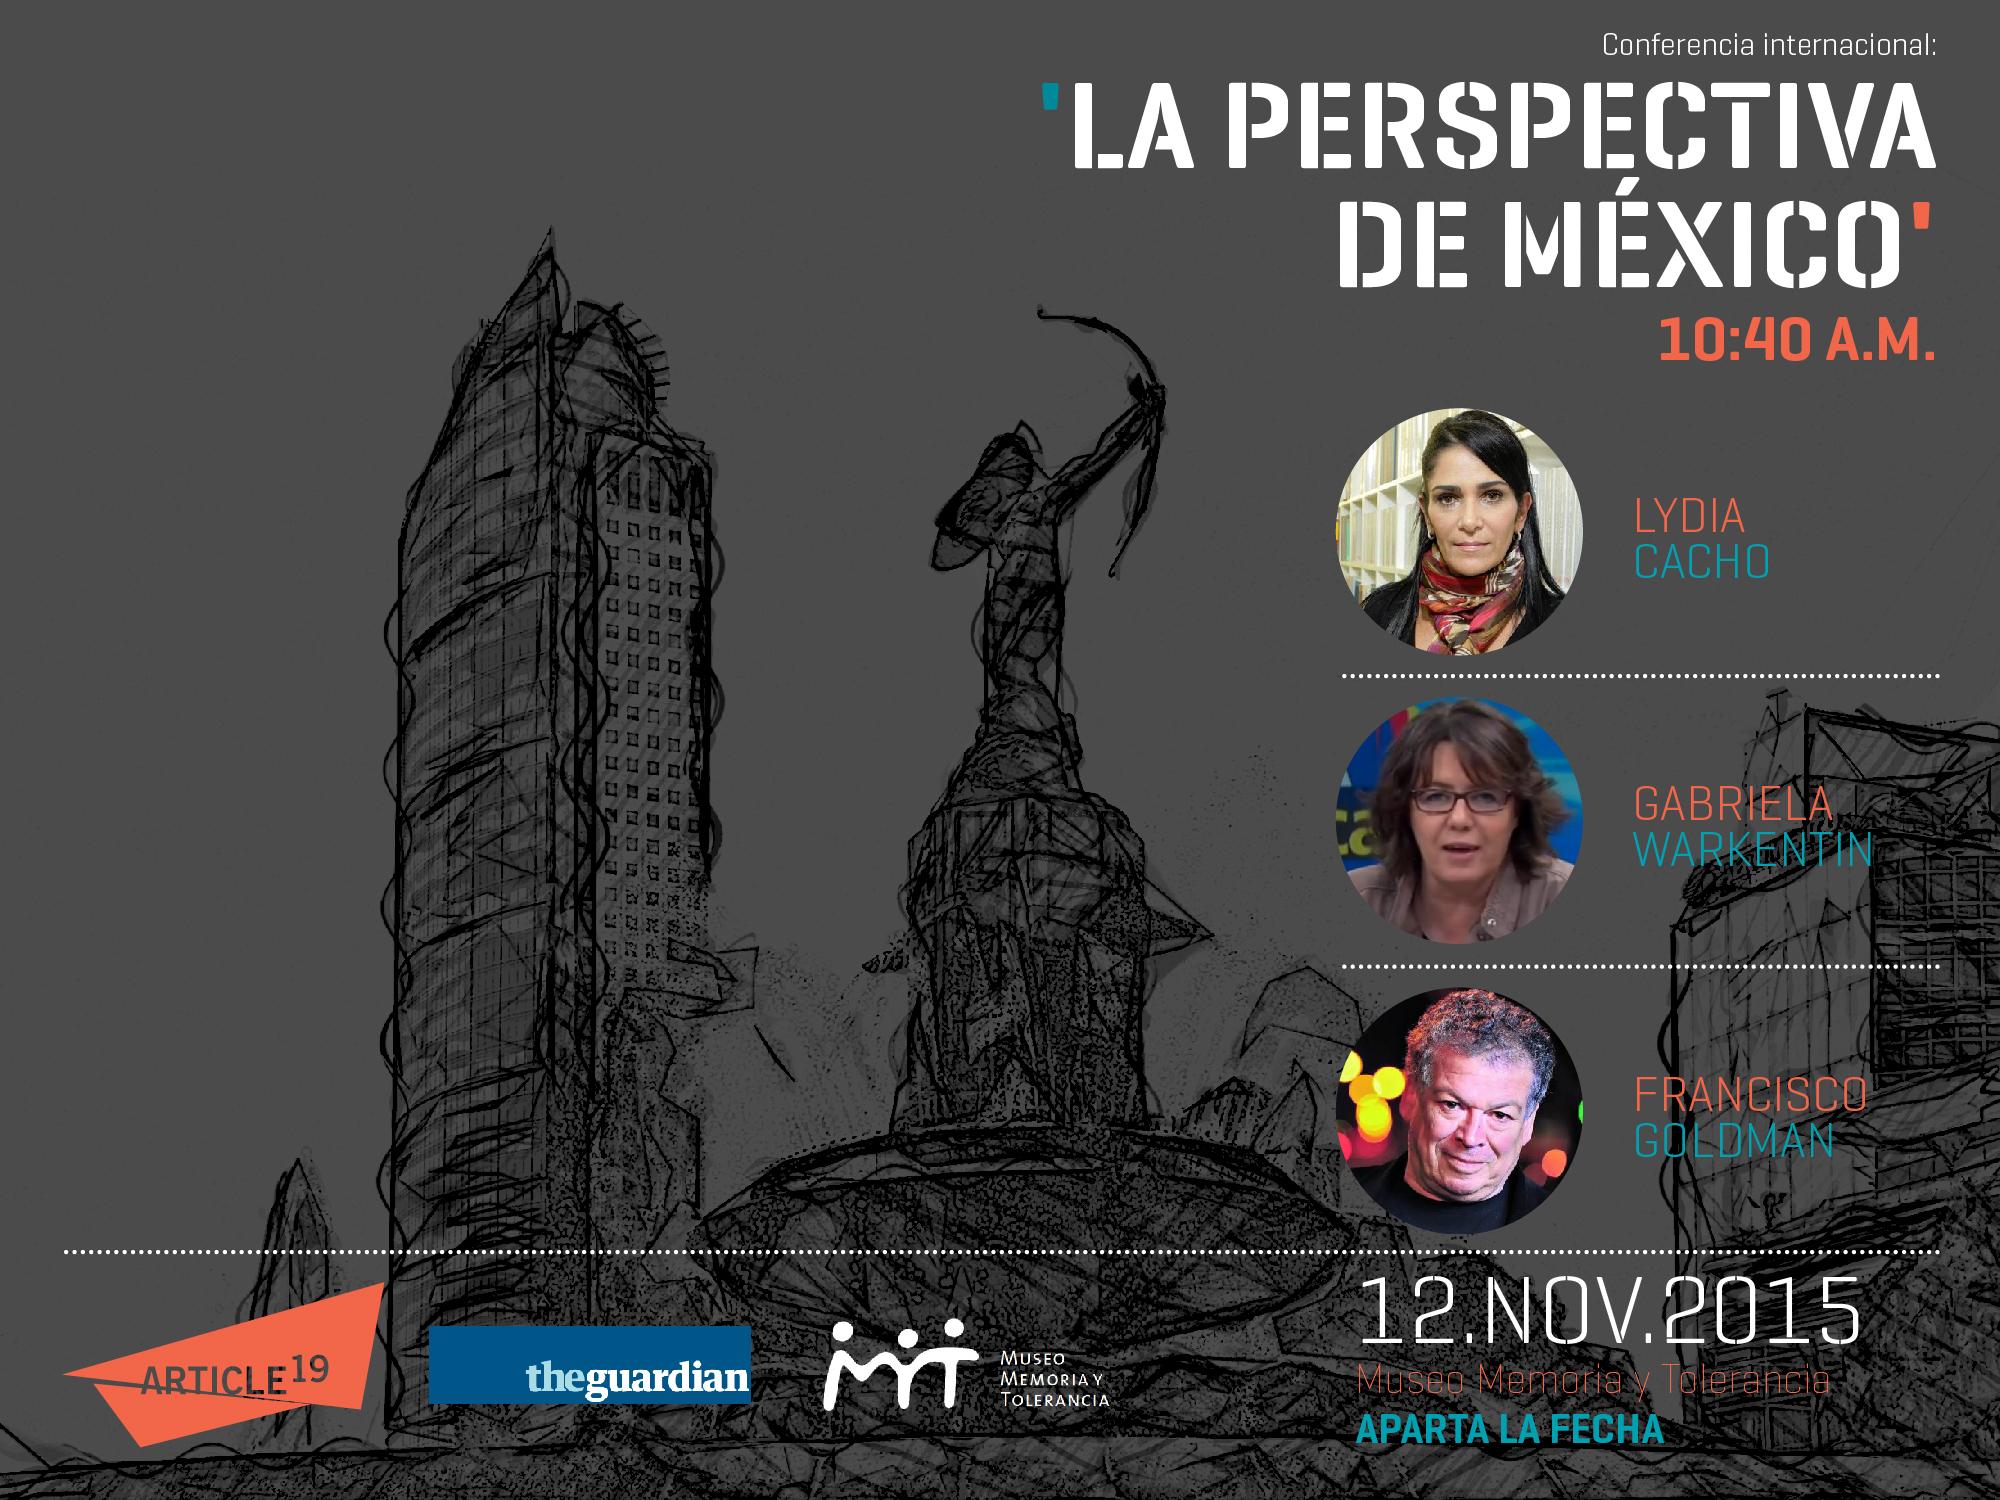 ART19_2015_conferencia 12 noviembre-05